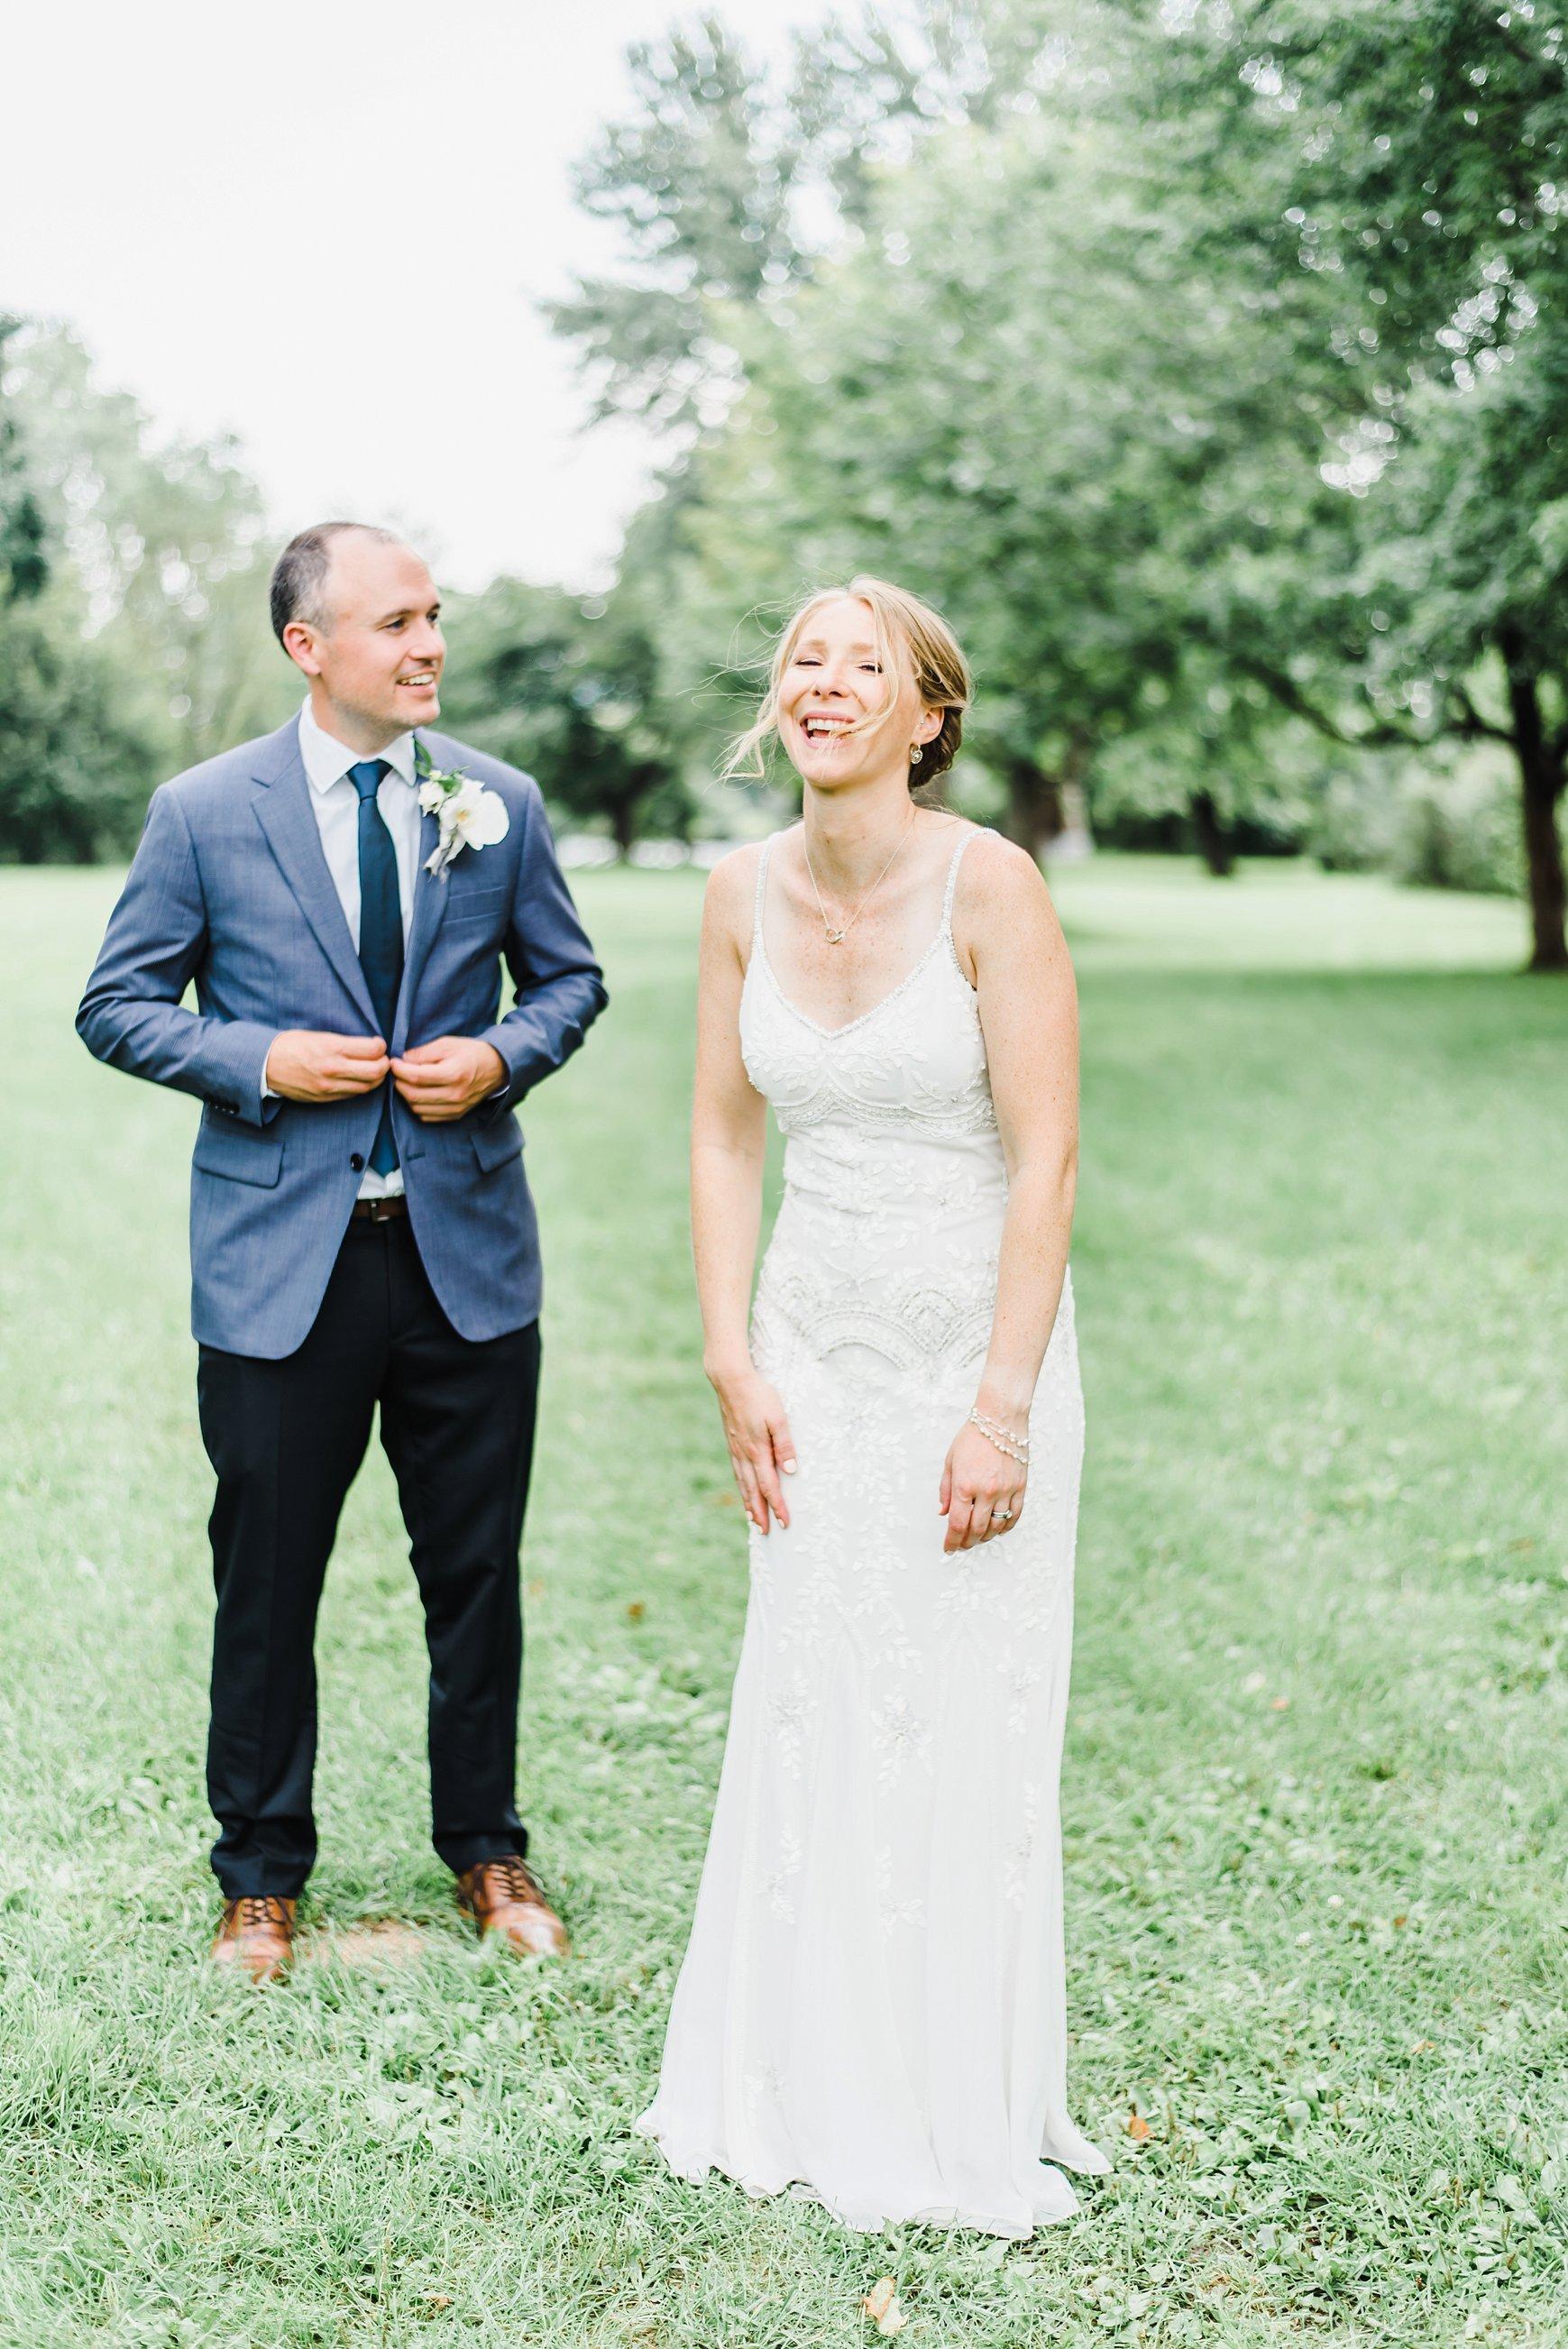 light airy indie fine art ottawa wedding photographer | Ali and Batoul Photography_0655.jpg